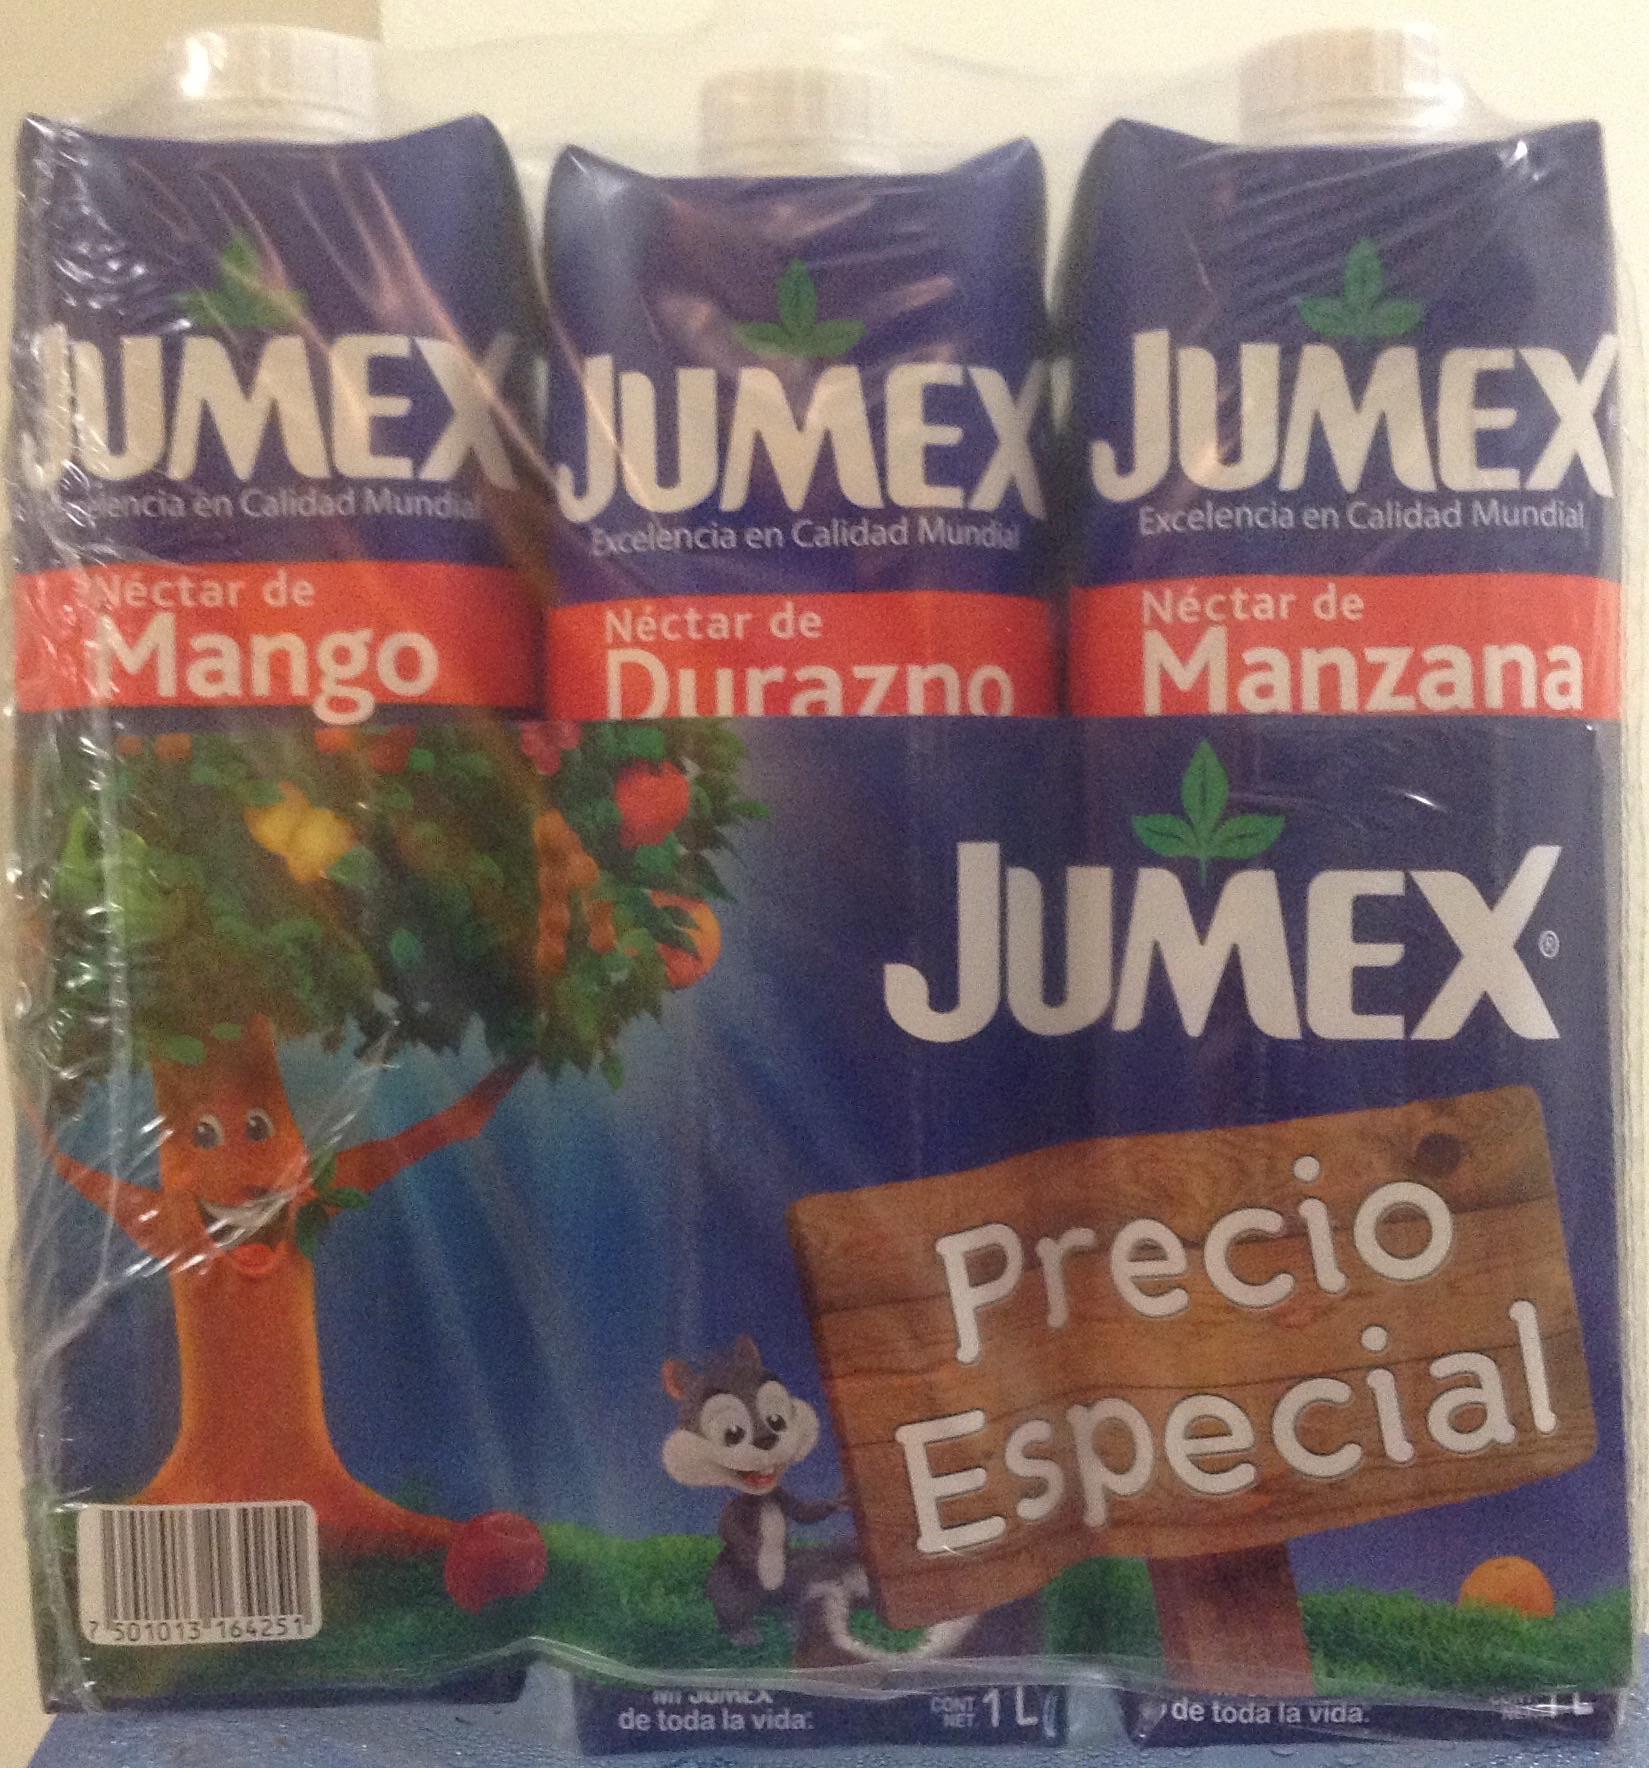 Bodega Aurrera: jugo Jumex 3 pack $15